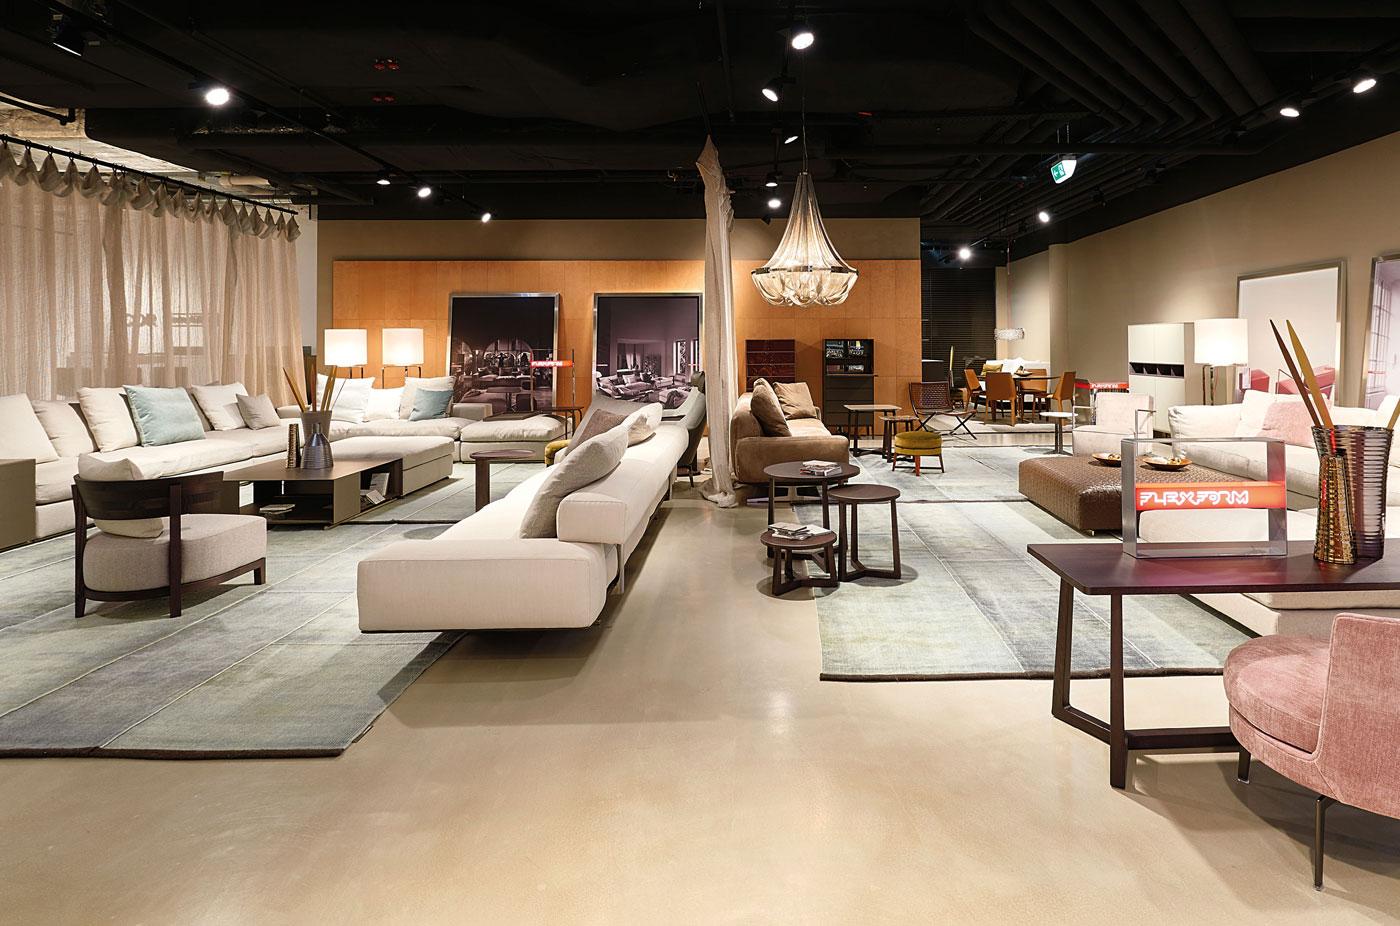 ramsaier raumdesign top magazin stuttgart. Black Bedroom Furniture Sets. Home Design Ideas